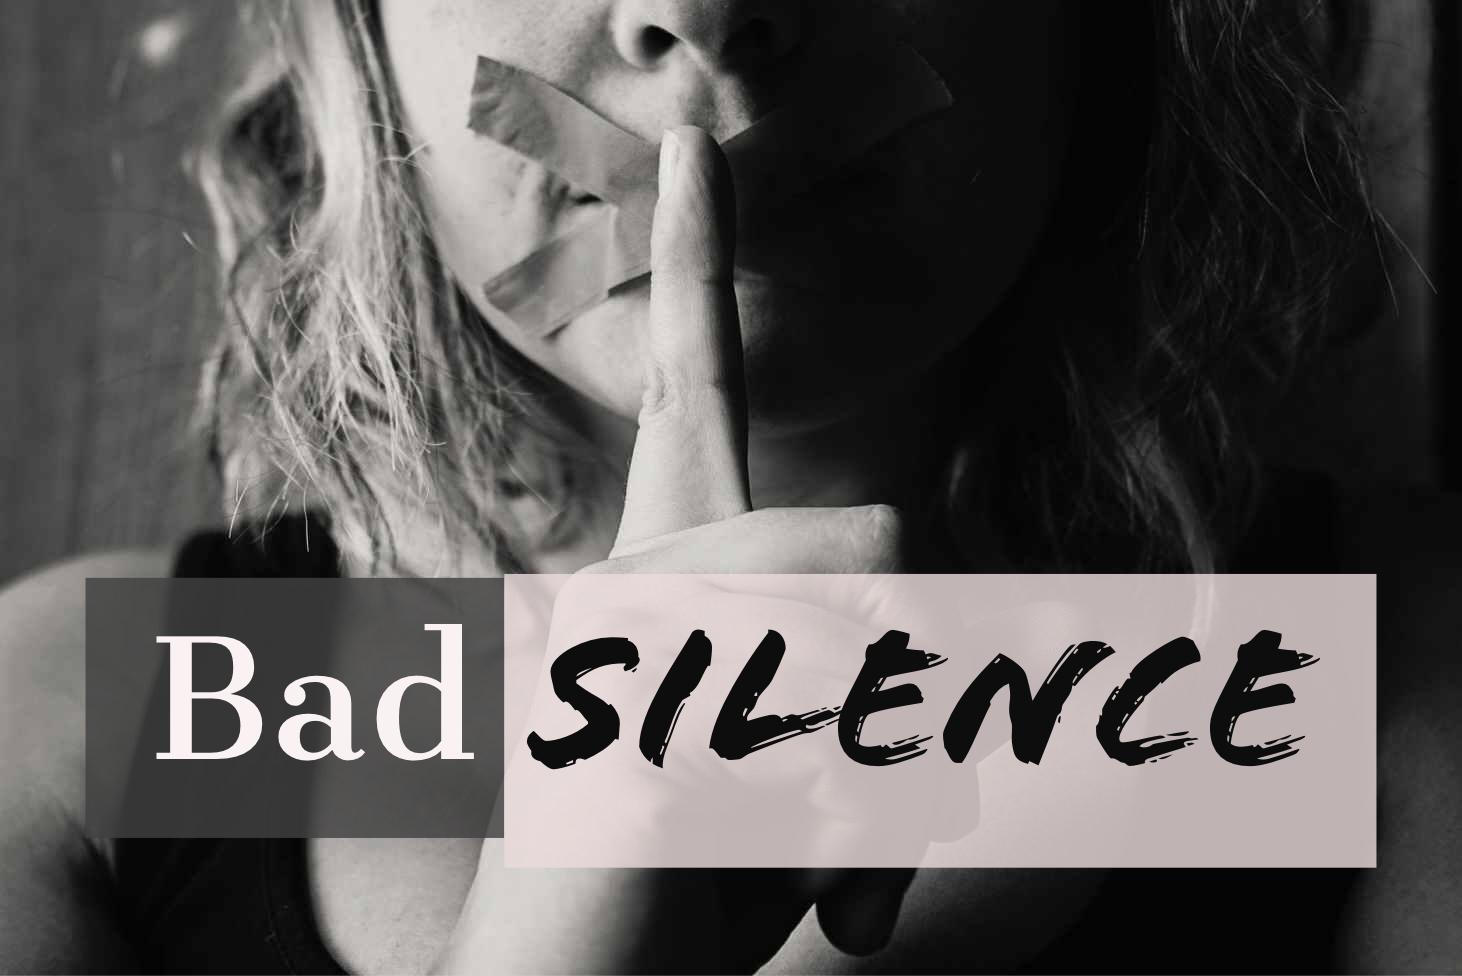 Bad-silence-image Bad Silence